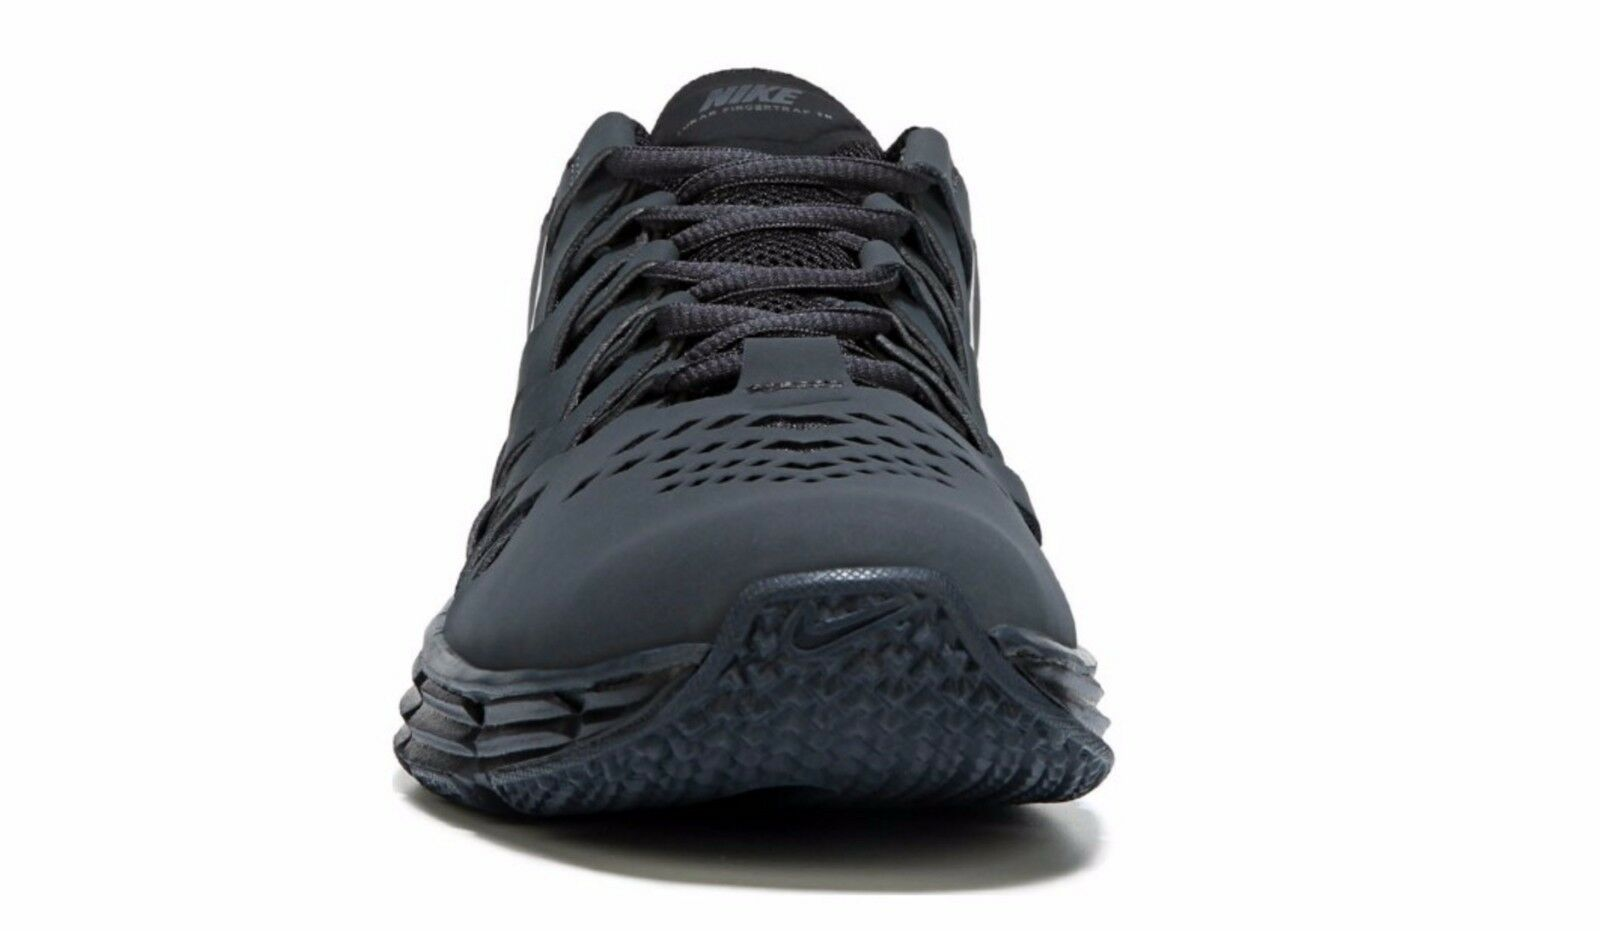 New NIKE  Hommes LUNAR FINGERTRAP TR TRAINING Chaussures  NIKE Gris / Noir 898066-010 dddd9c